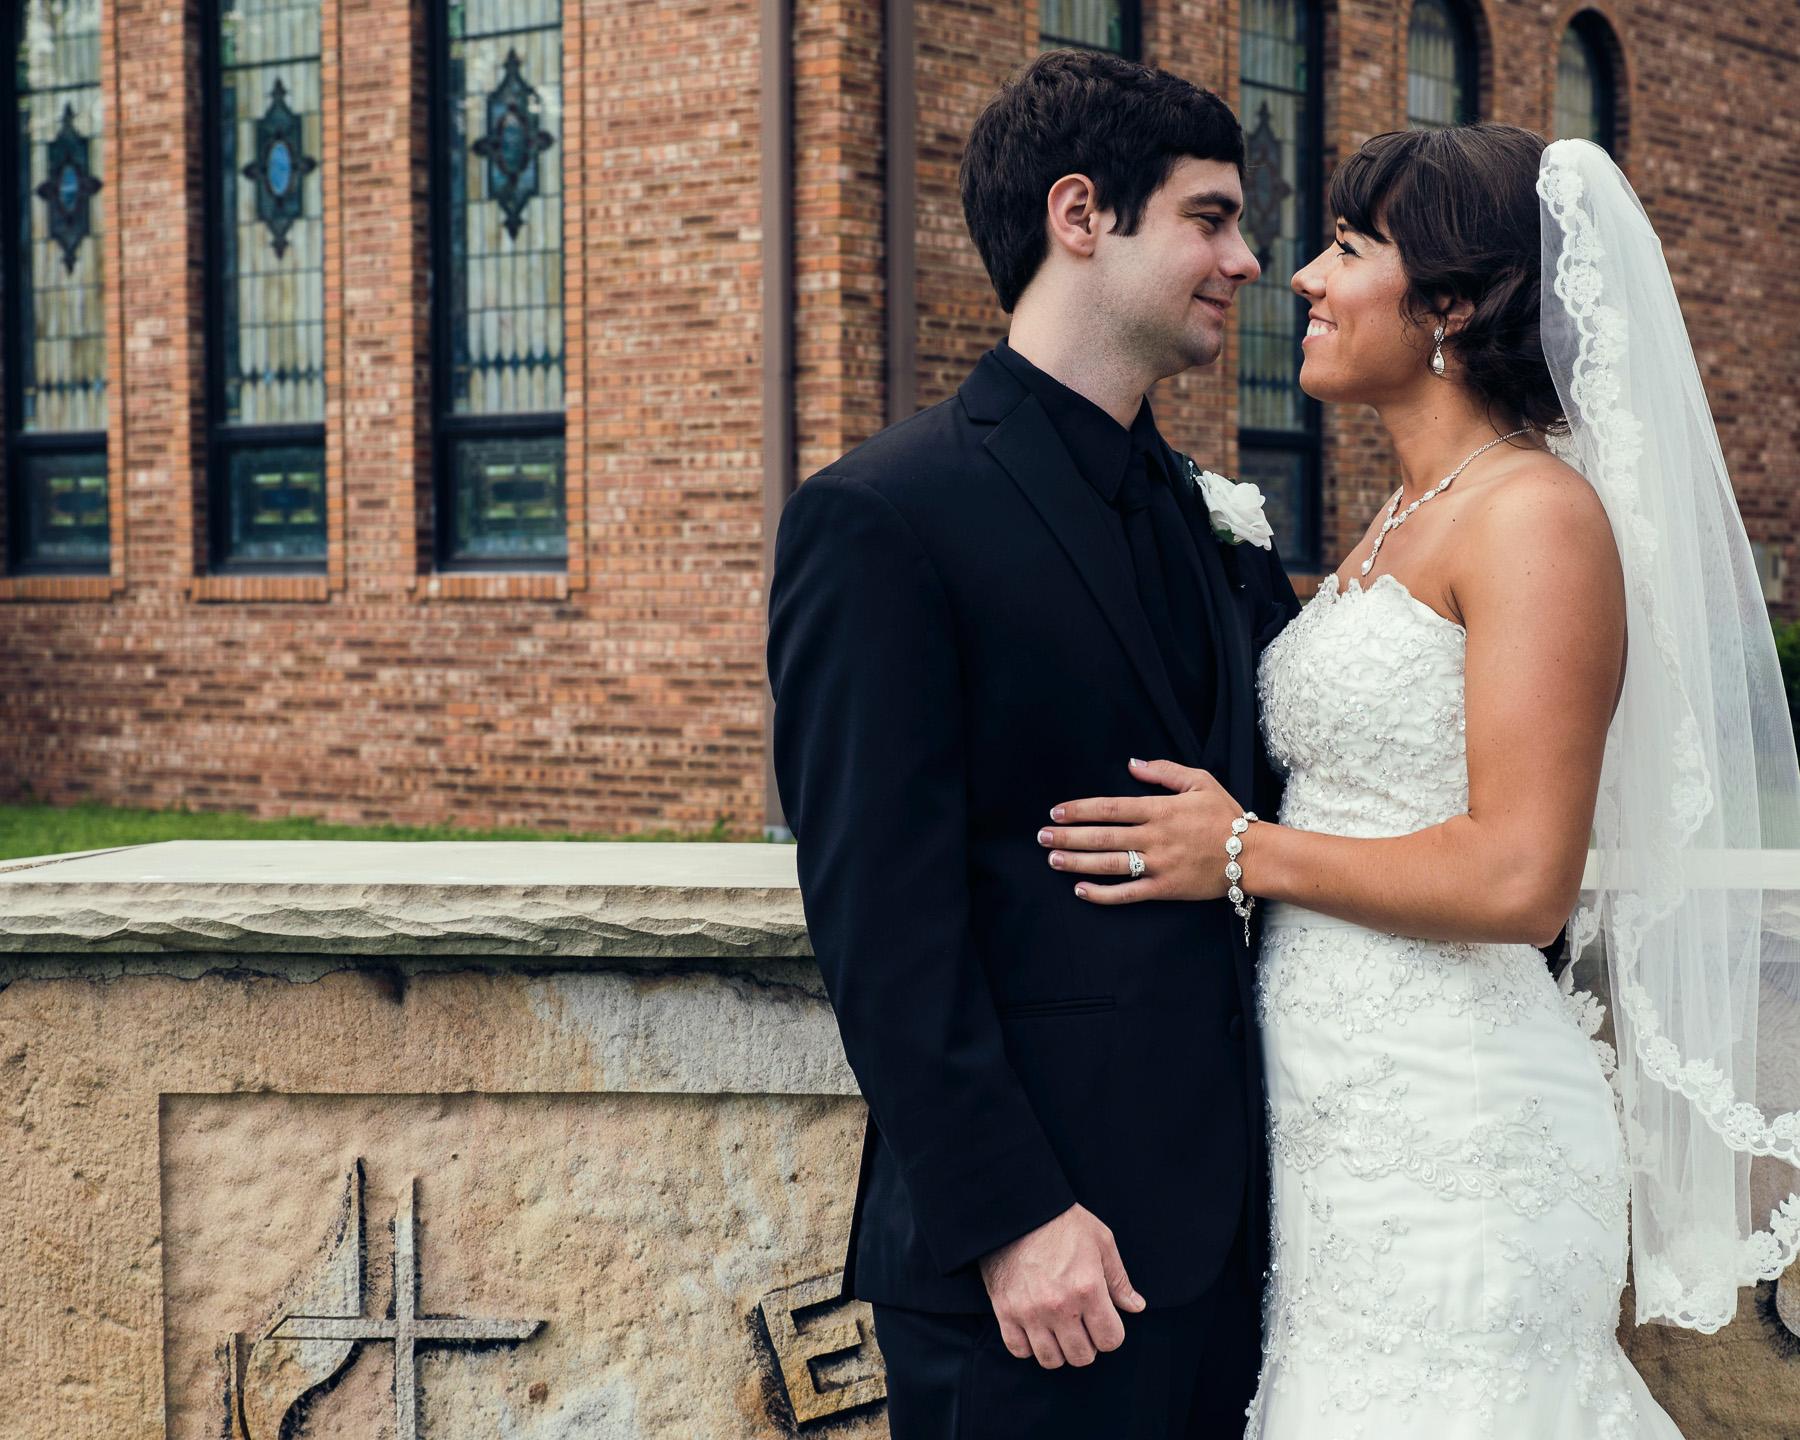 Conner_Wedding_Edits_Web-159.jpg